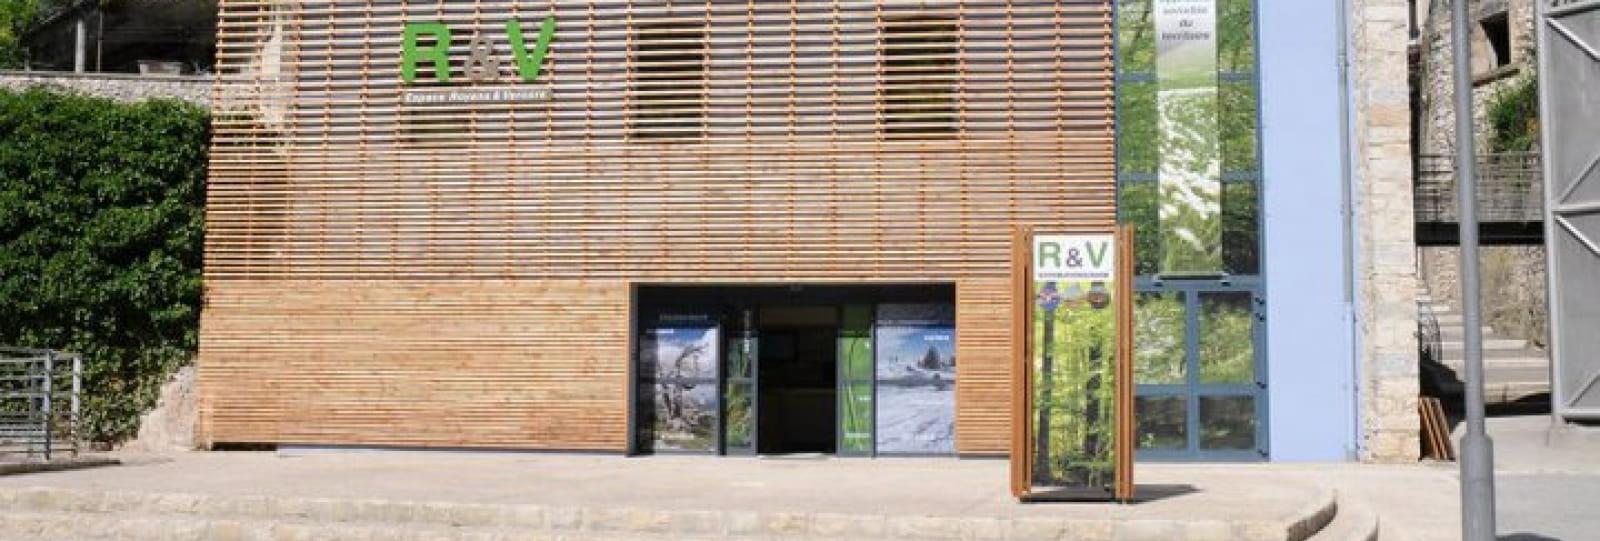 Espace Royans & Vercors